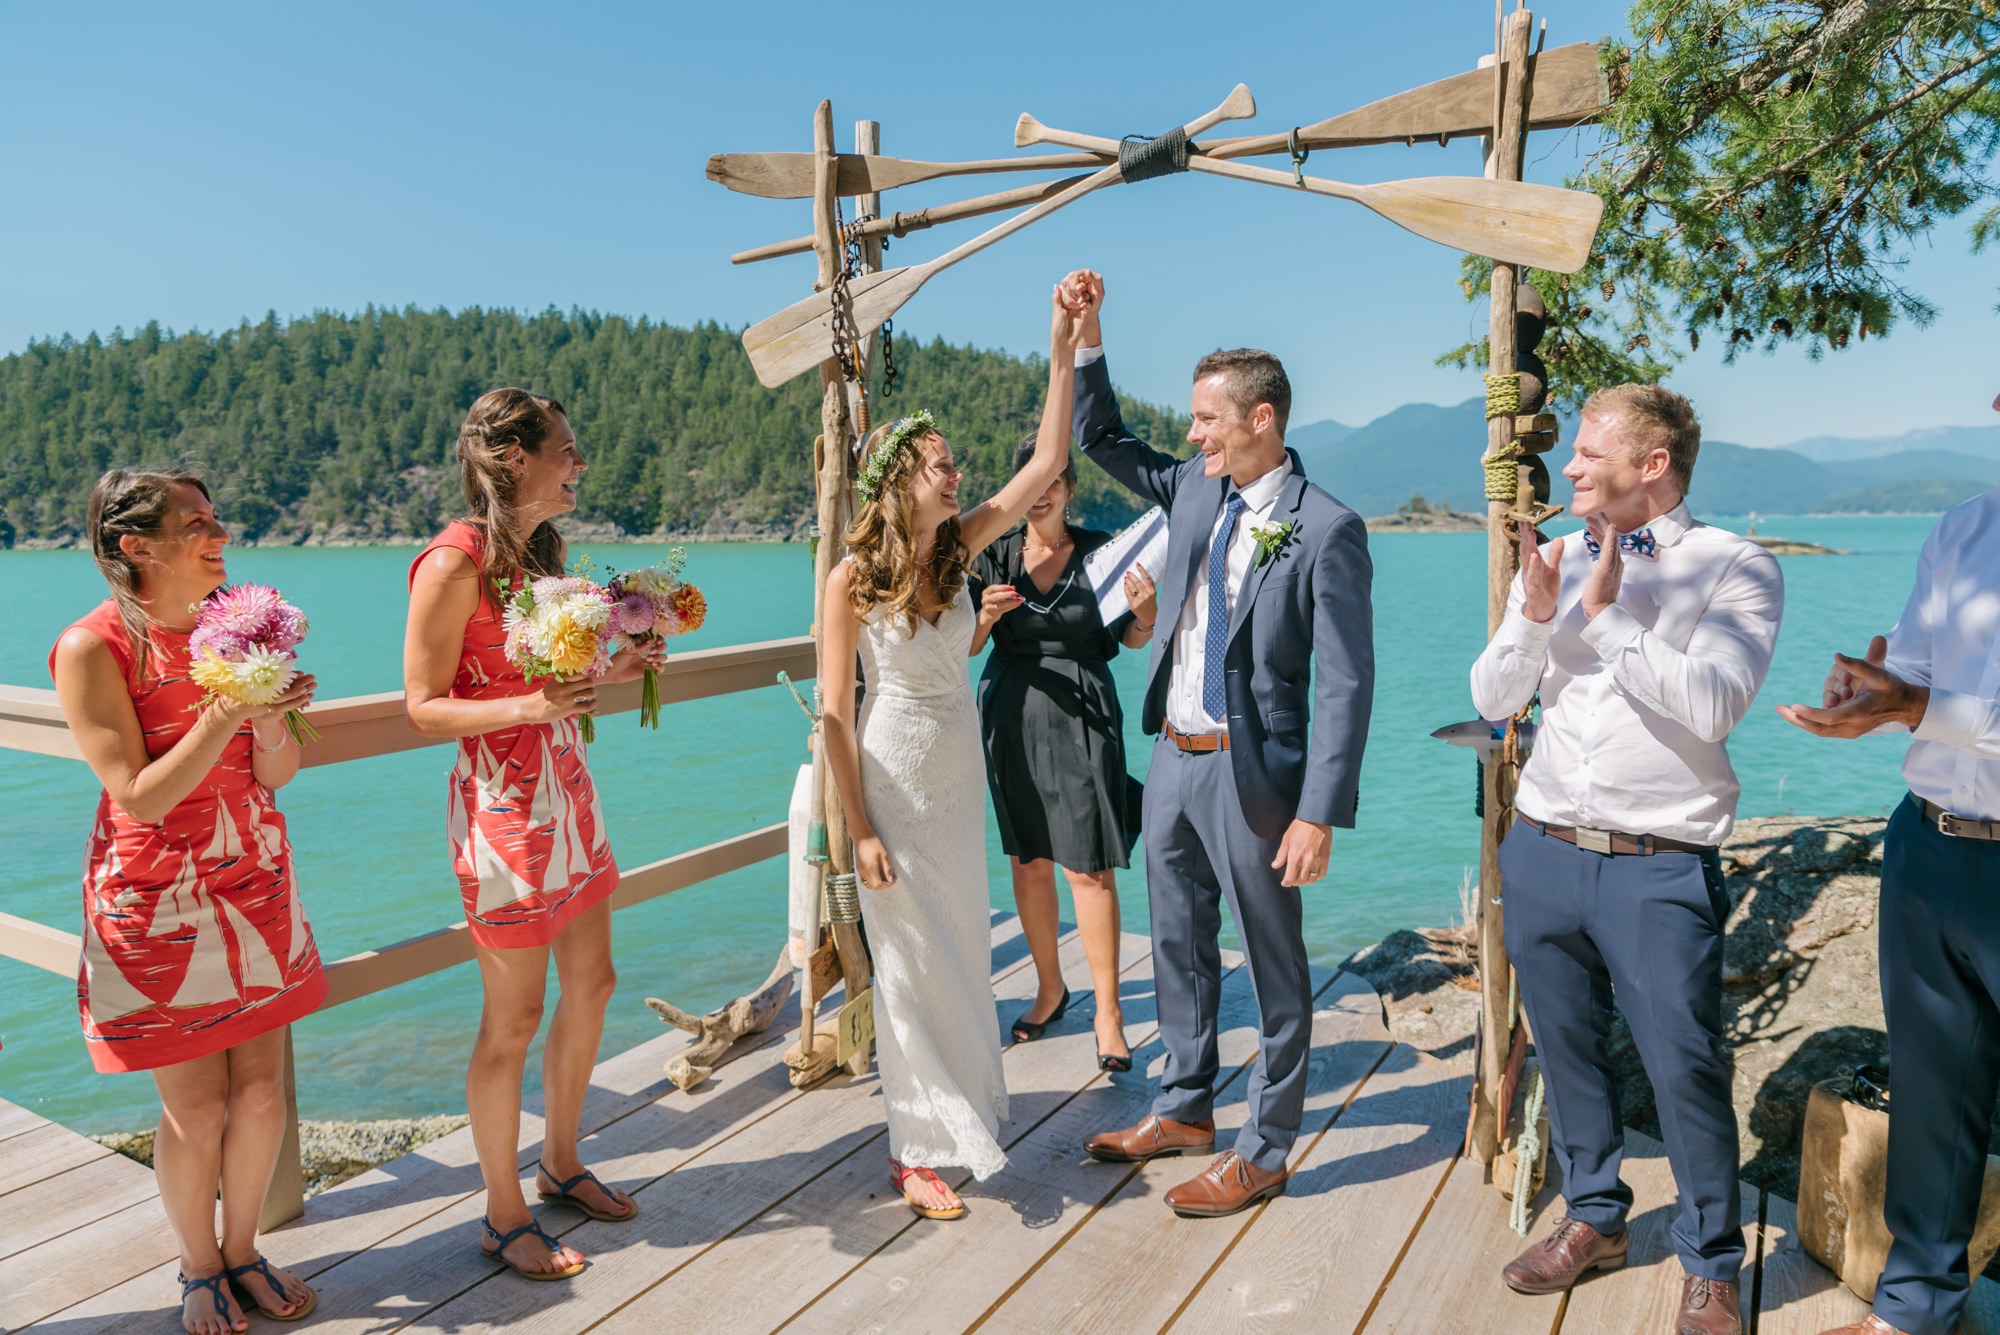 bowen_island_wedding_photographer_vancouver142905_21_ally&james.jpg